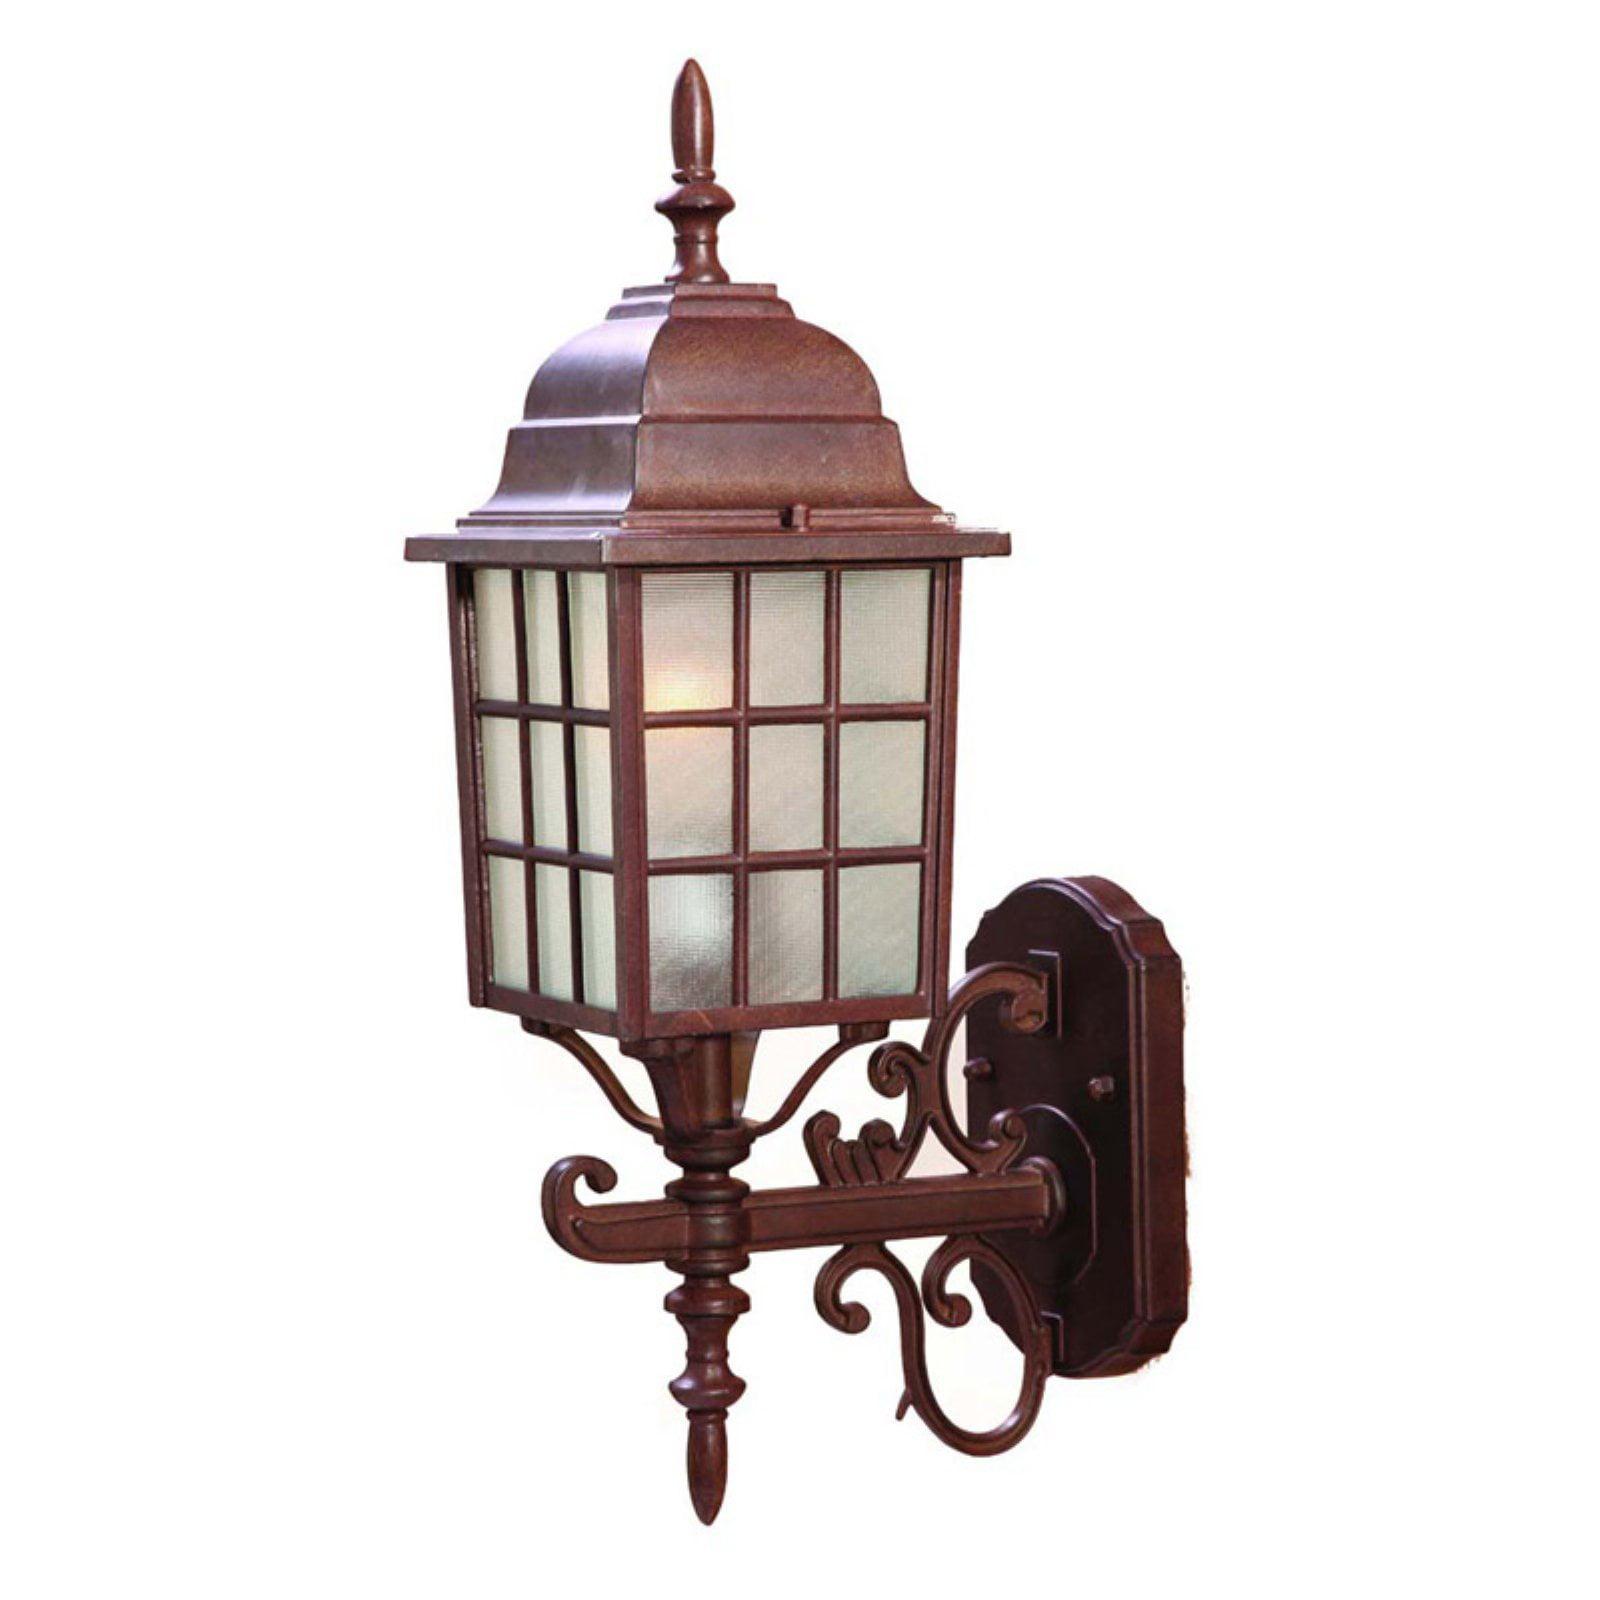 Acclaim Lighting Nautica Outdoor Wall Mount Light Fixture